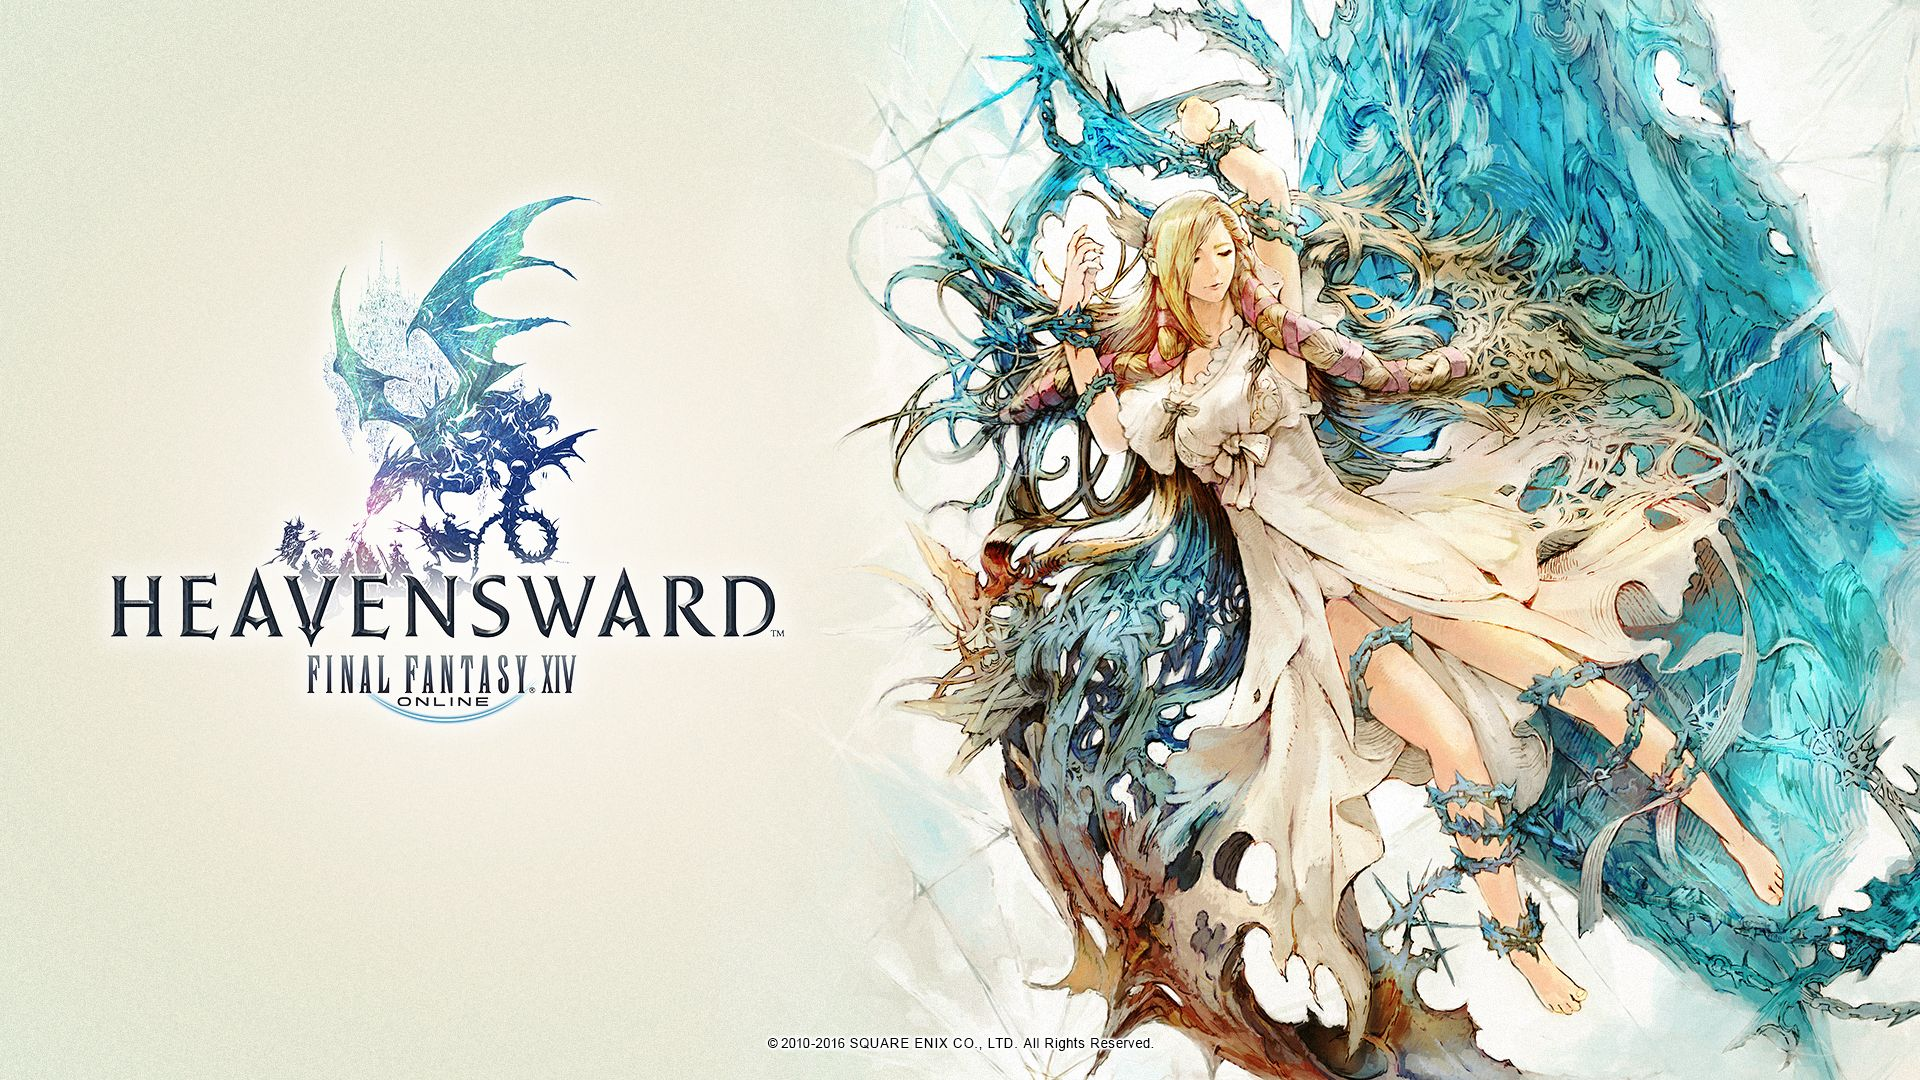 L9tumqjf61tqbokgqp78dbh344 Jpg 1920 1080 Final Fantasy Final Fantasy Xiv Fantasy